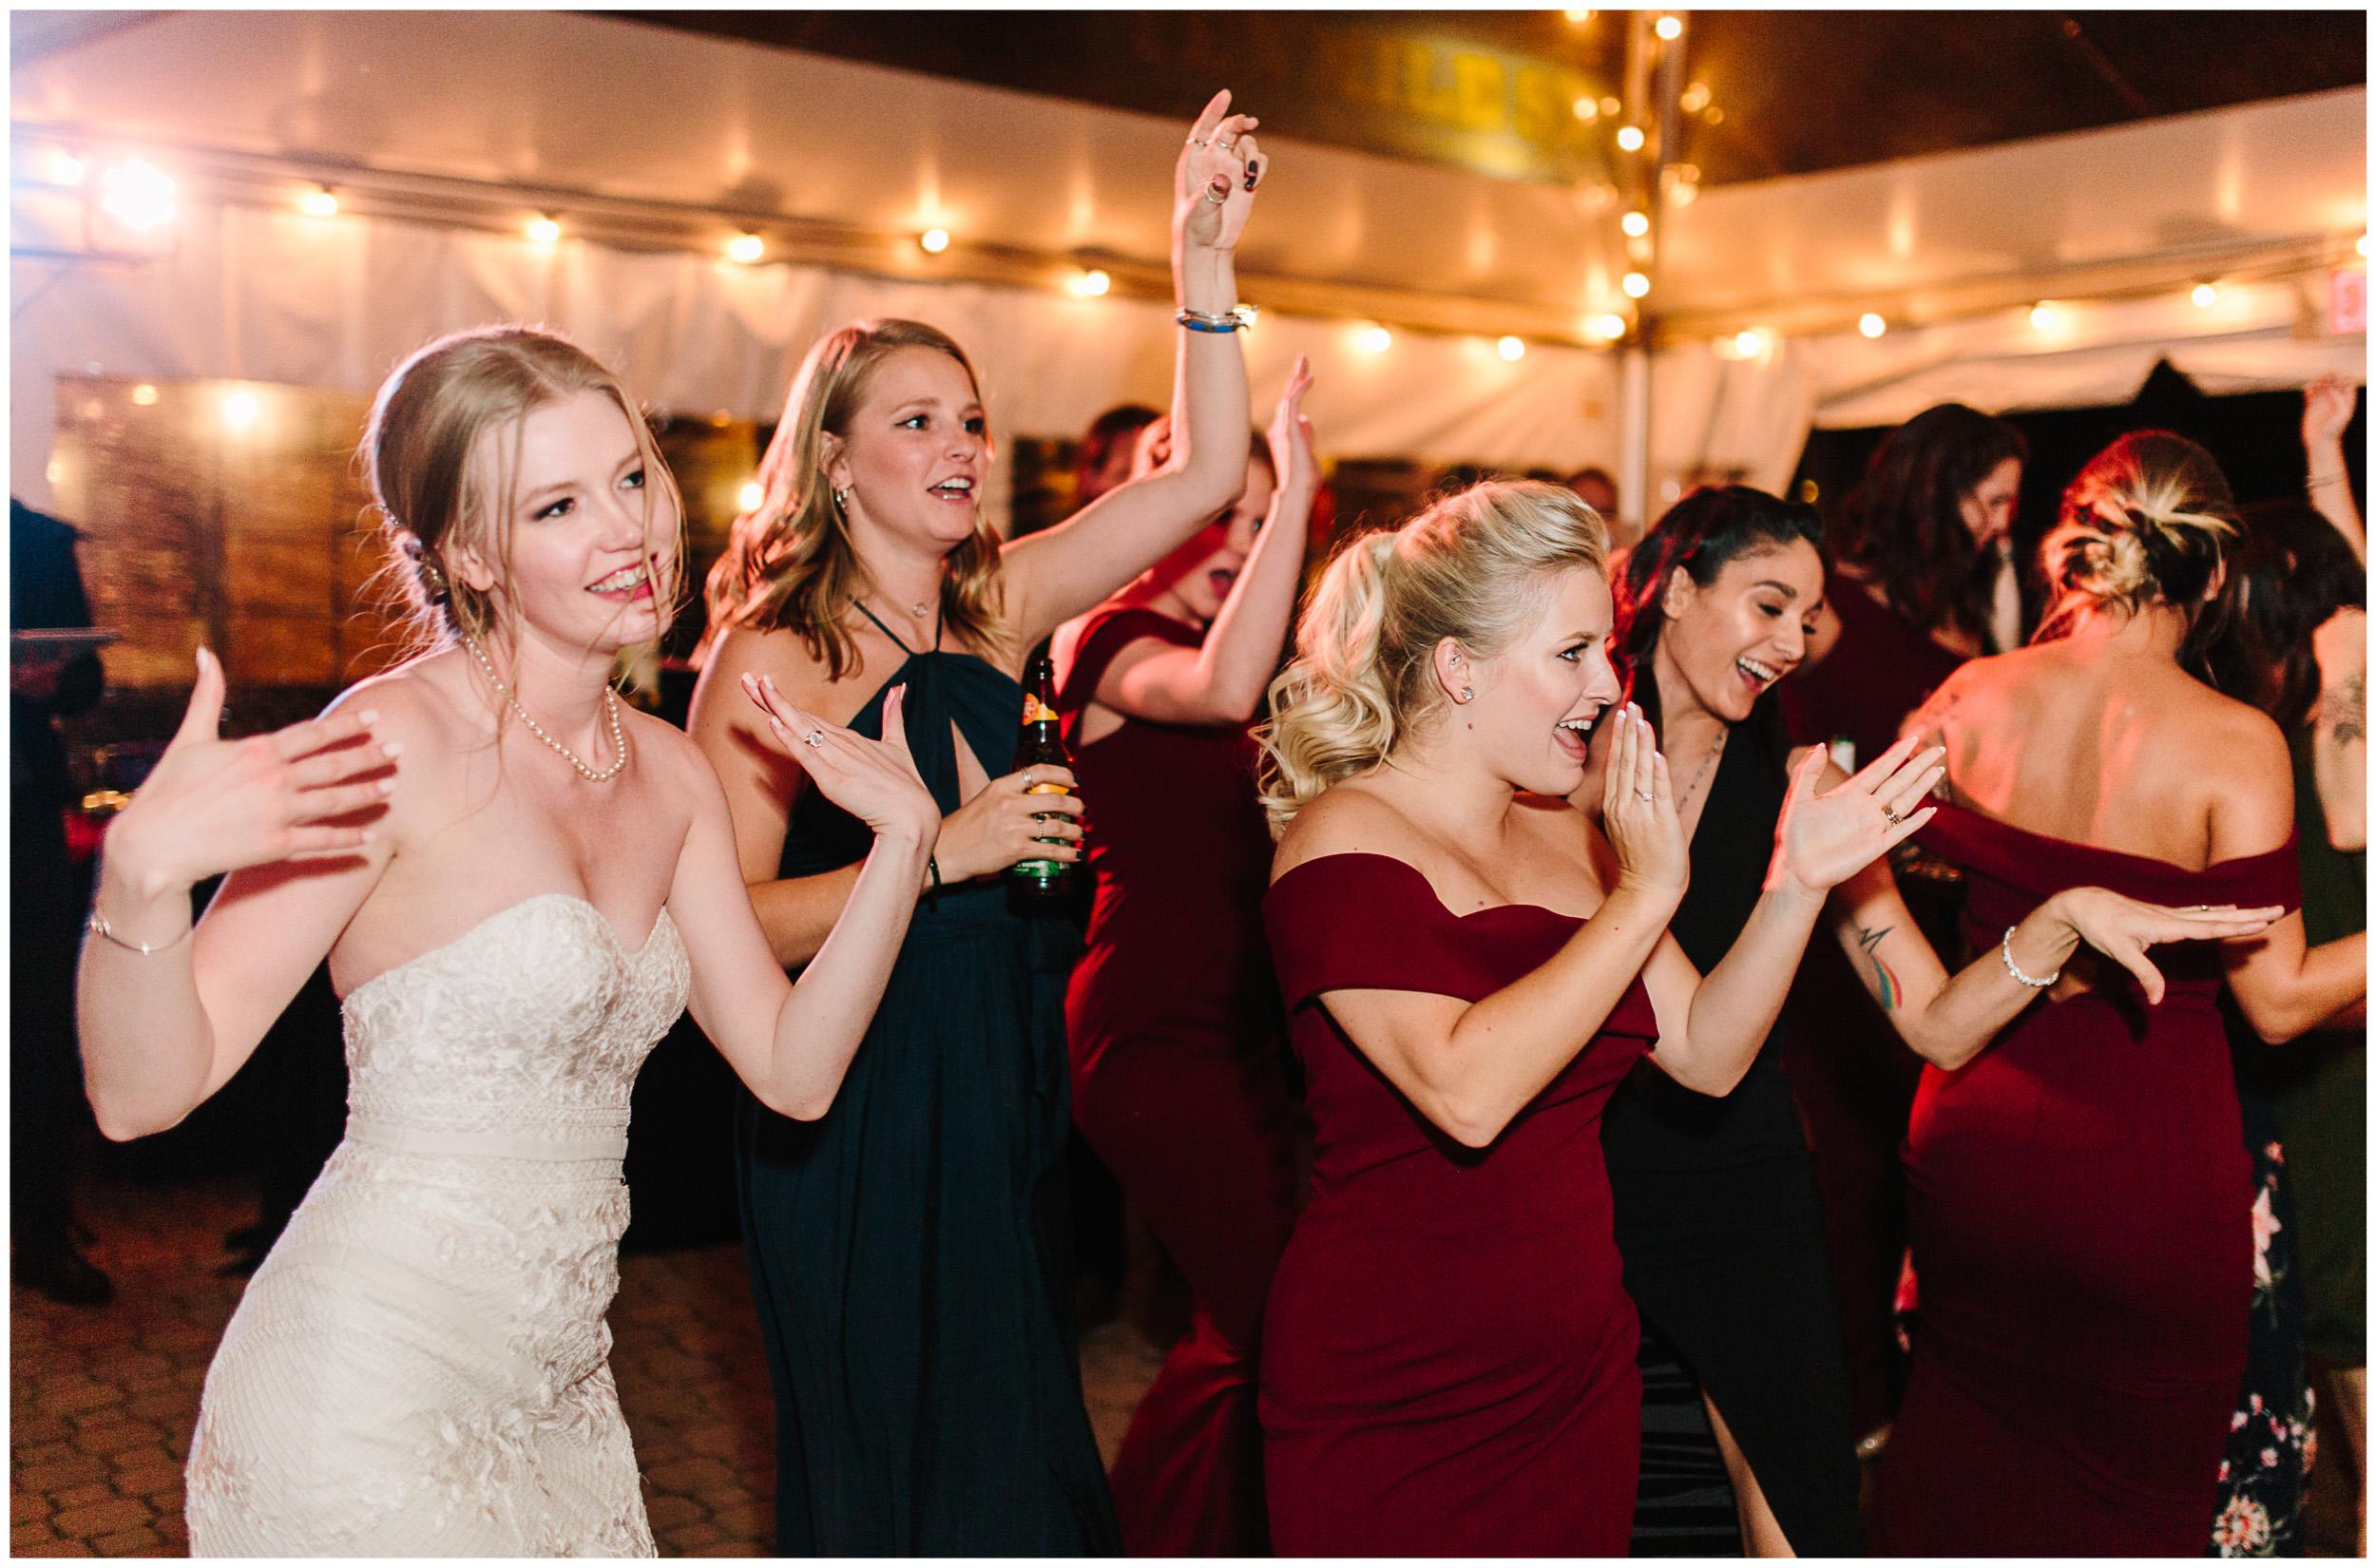 ten_mile_station_wedding_91.jpg